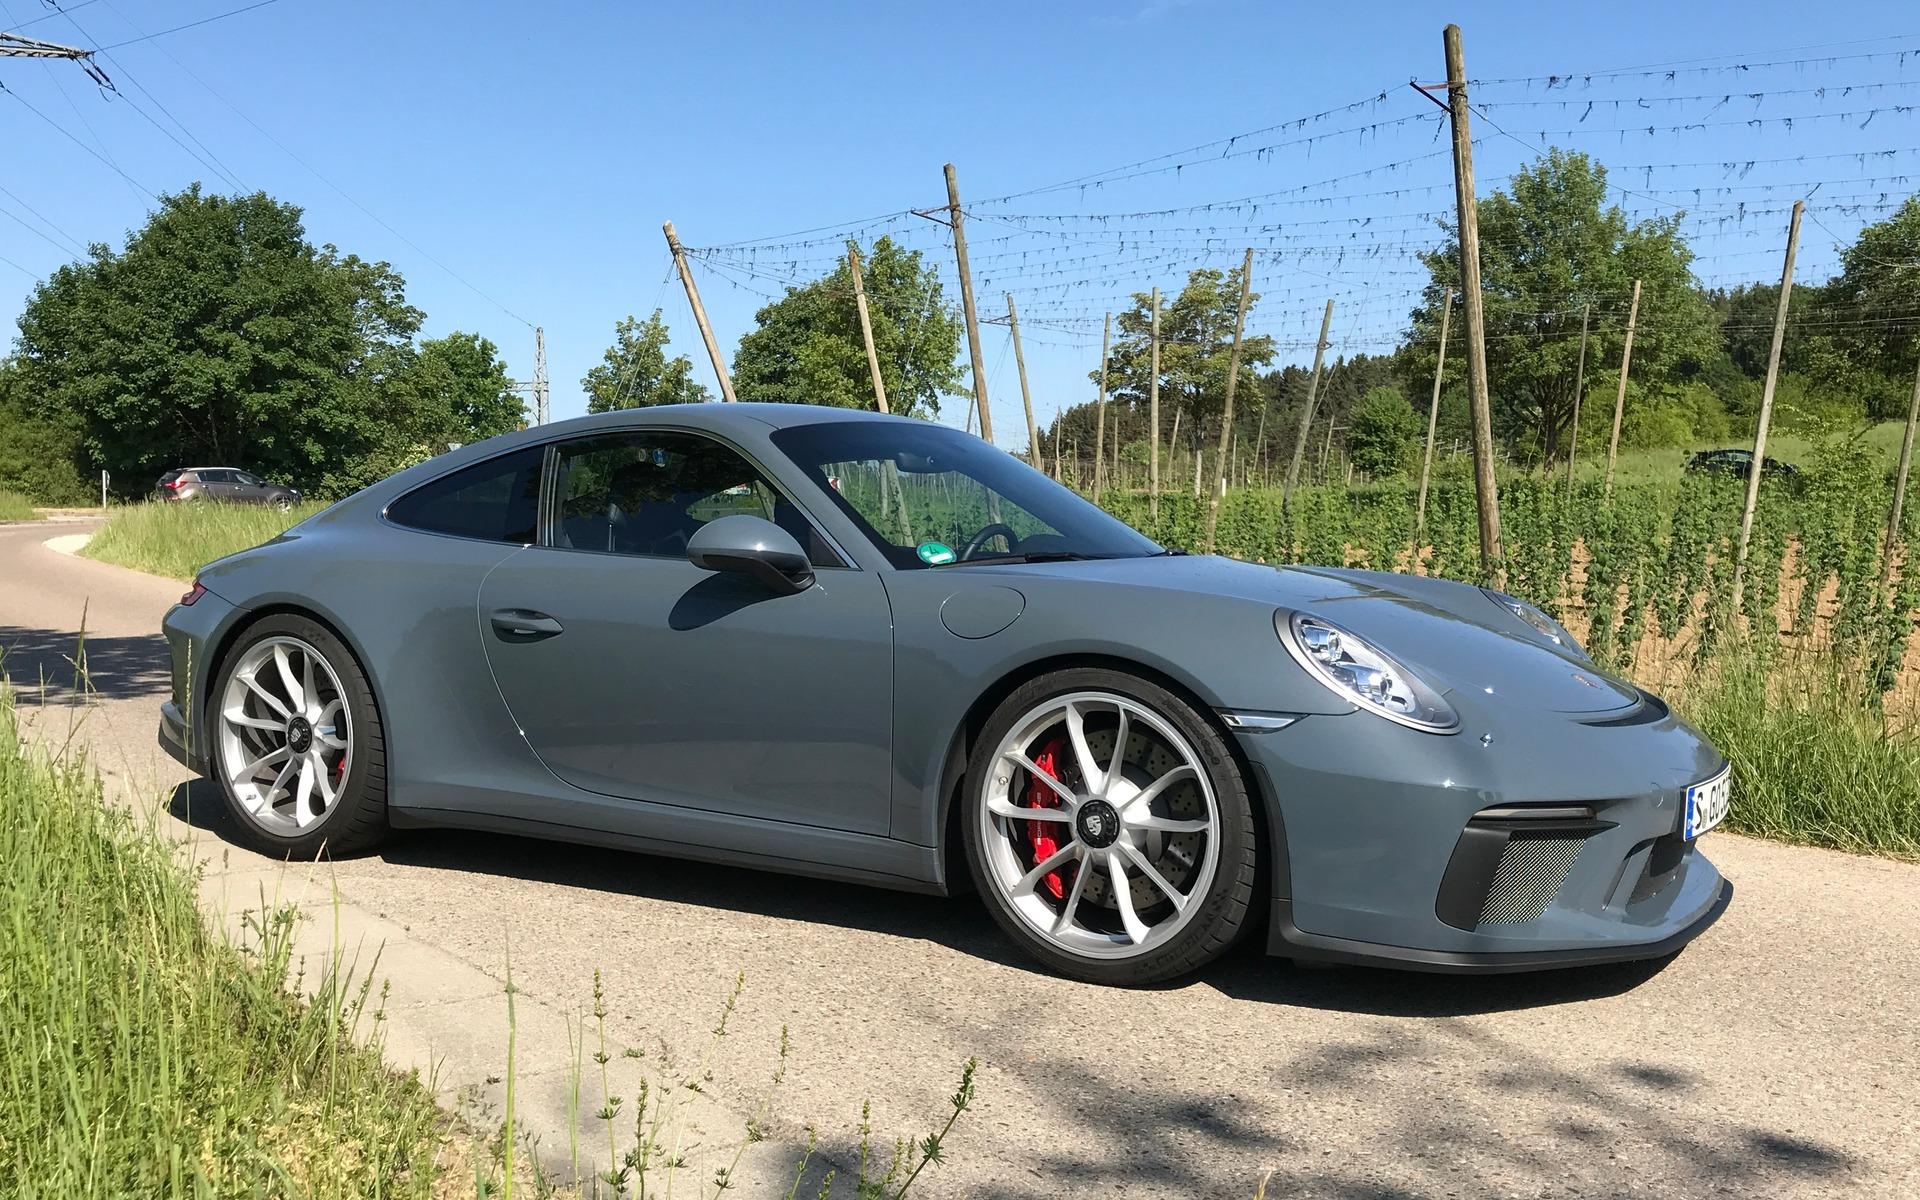 Porsche GT3 Touring 2018